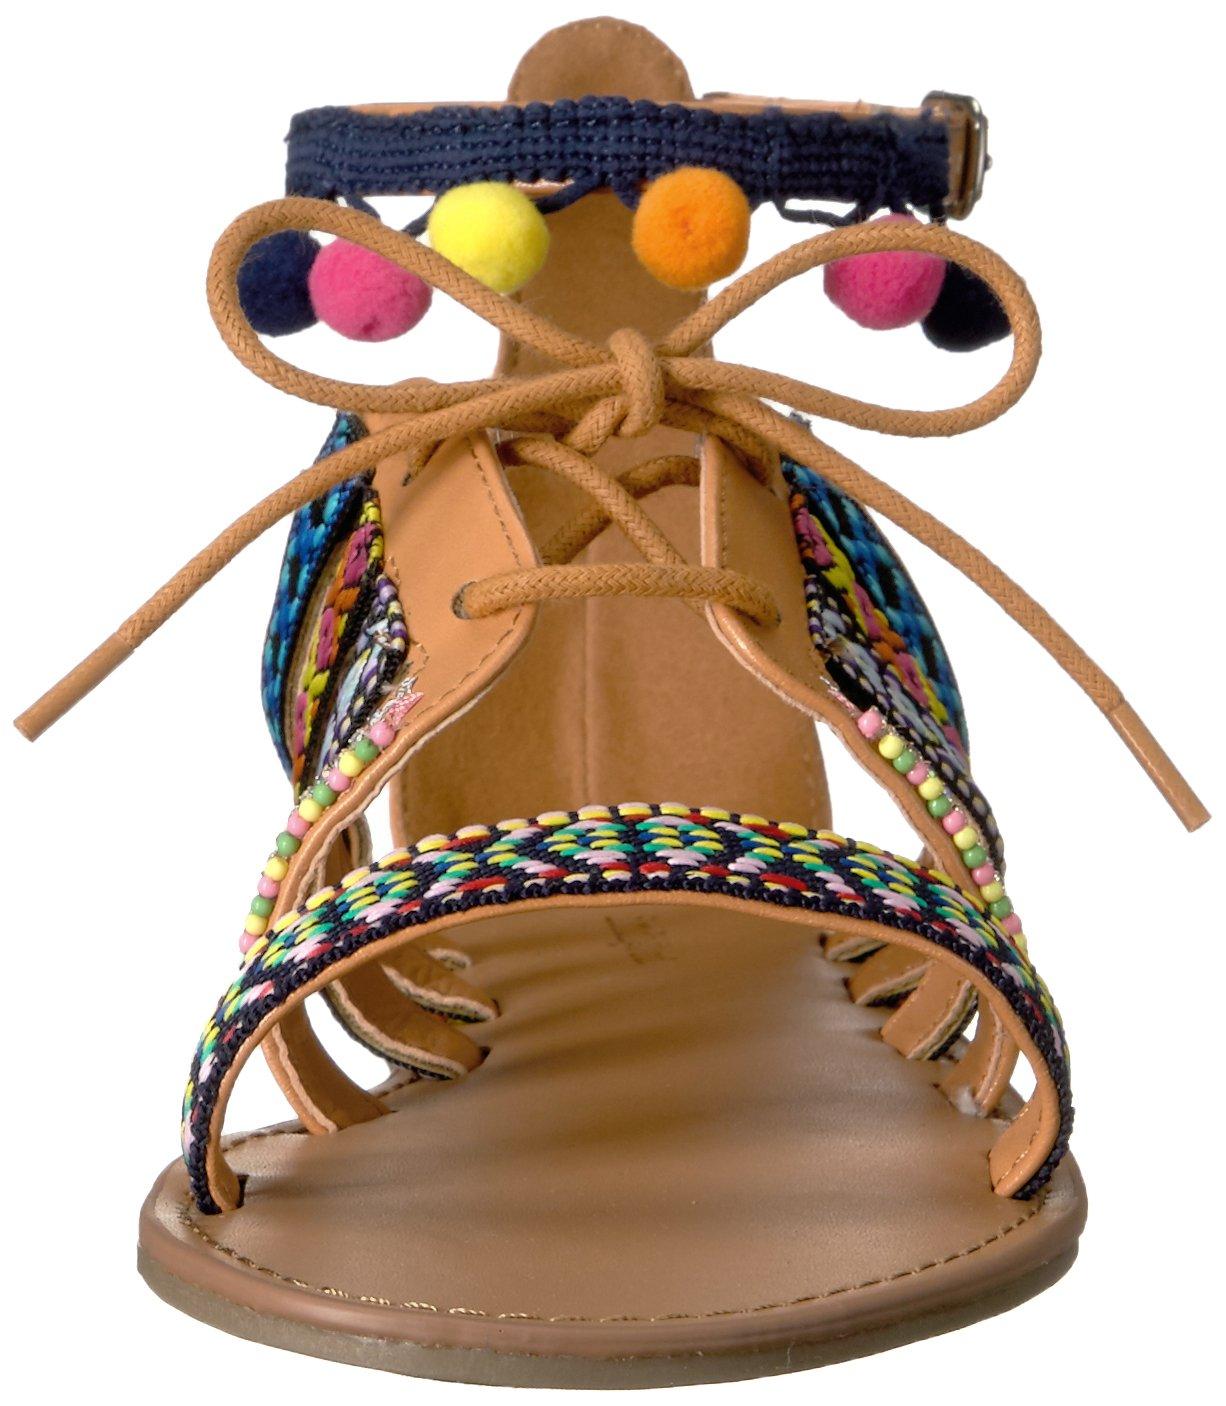 Indigo Rd. Women's Baria B(M) Flat Sandal B01M0DDIA9 9 B(M) Baria US|Pink/Multi 625c2f